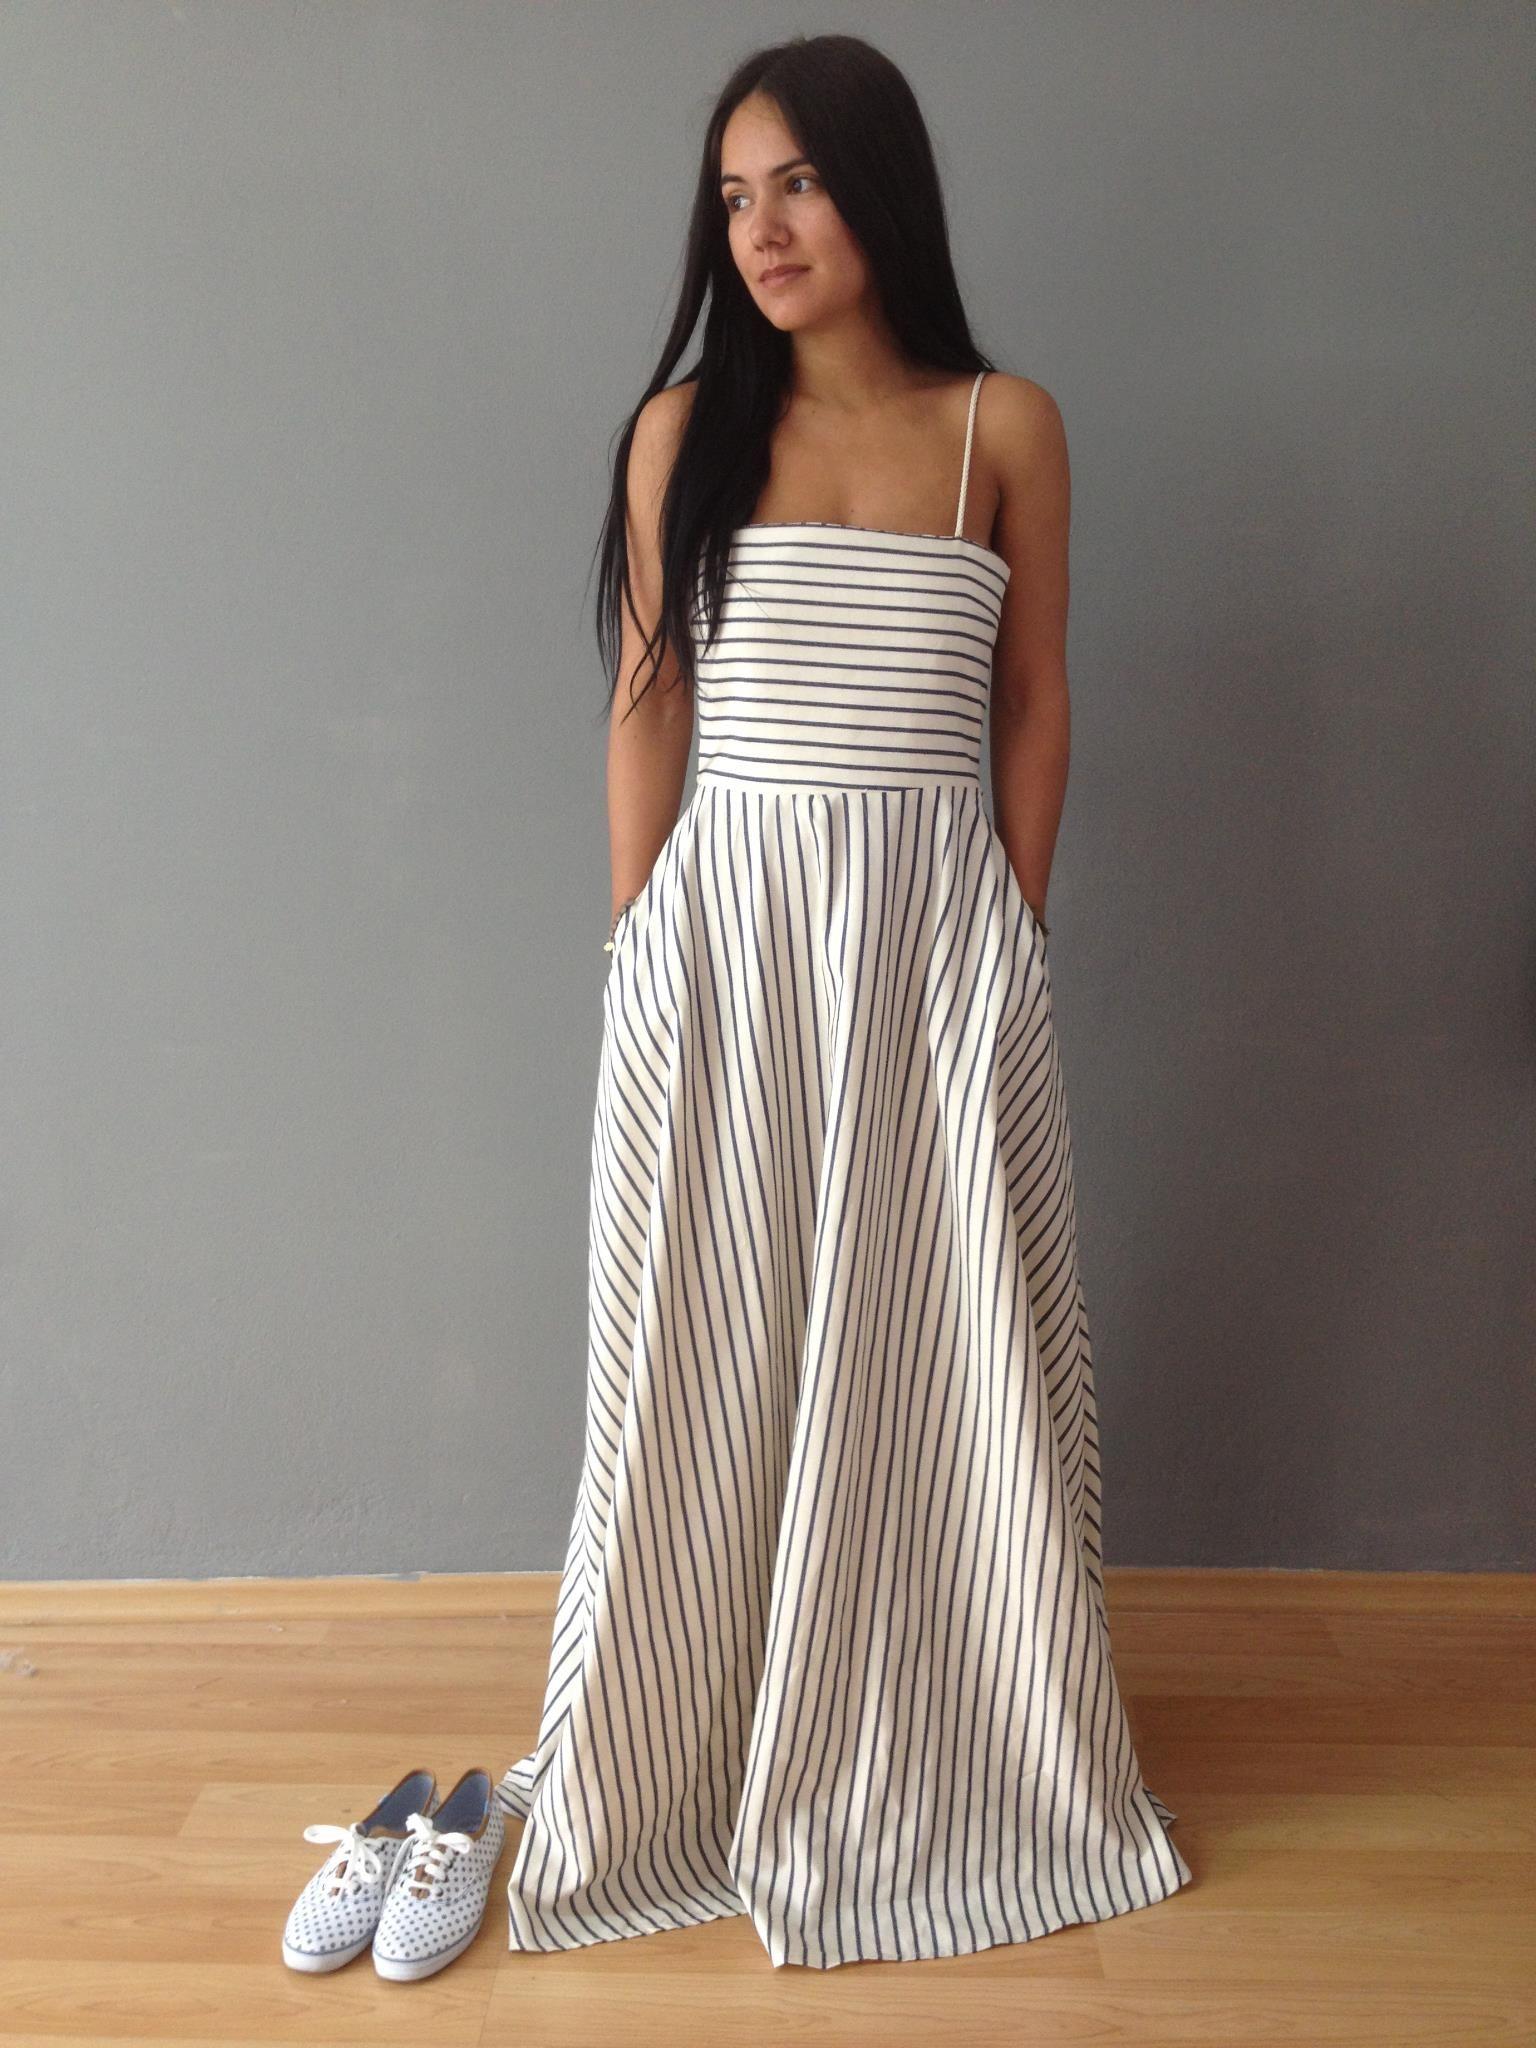 Play Dresses for Women